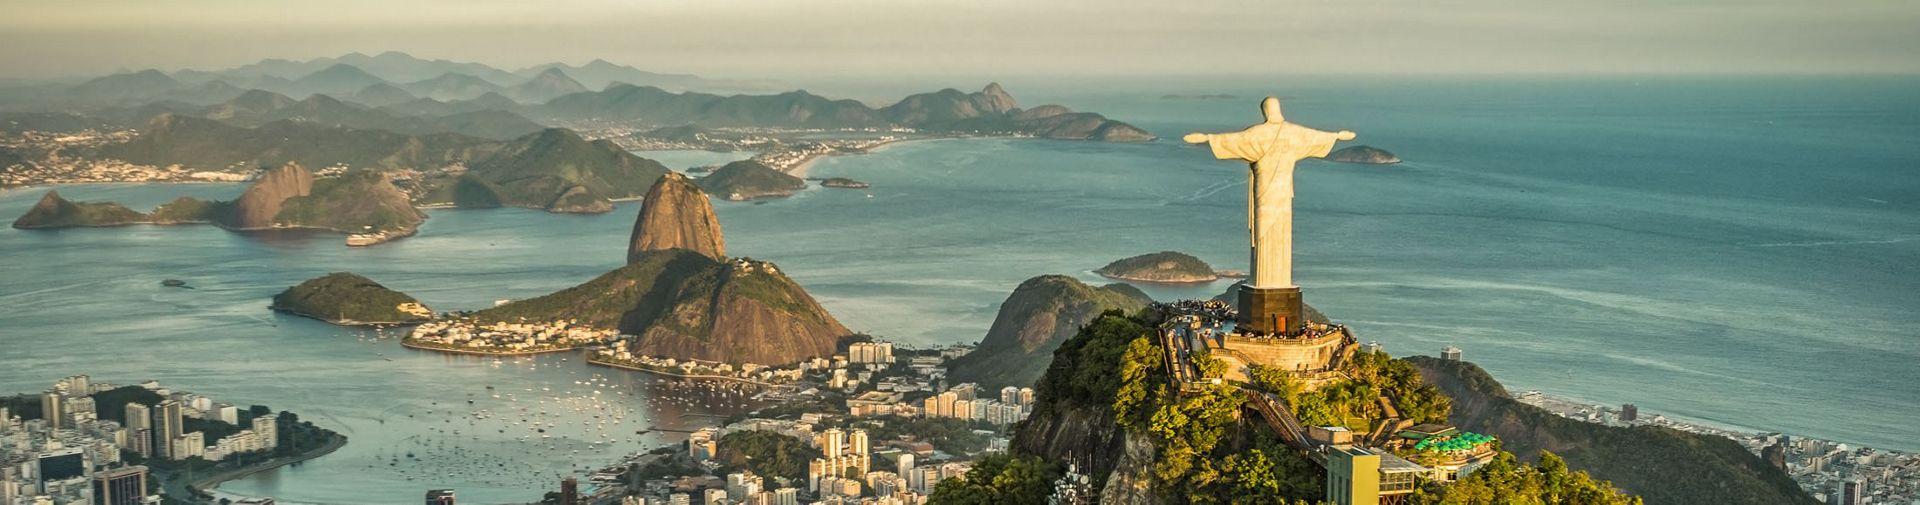 Grand Voyage 2018 – Südamerika